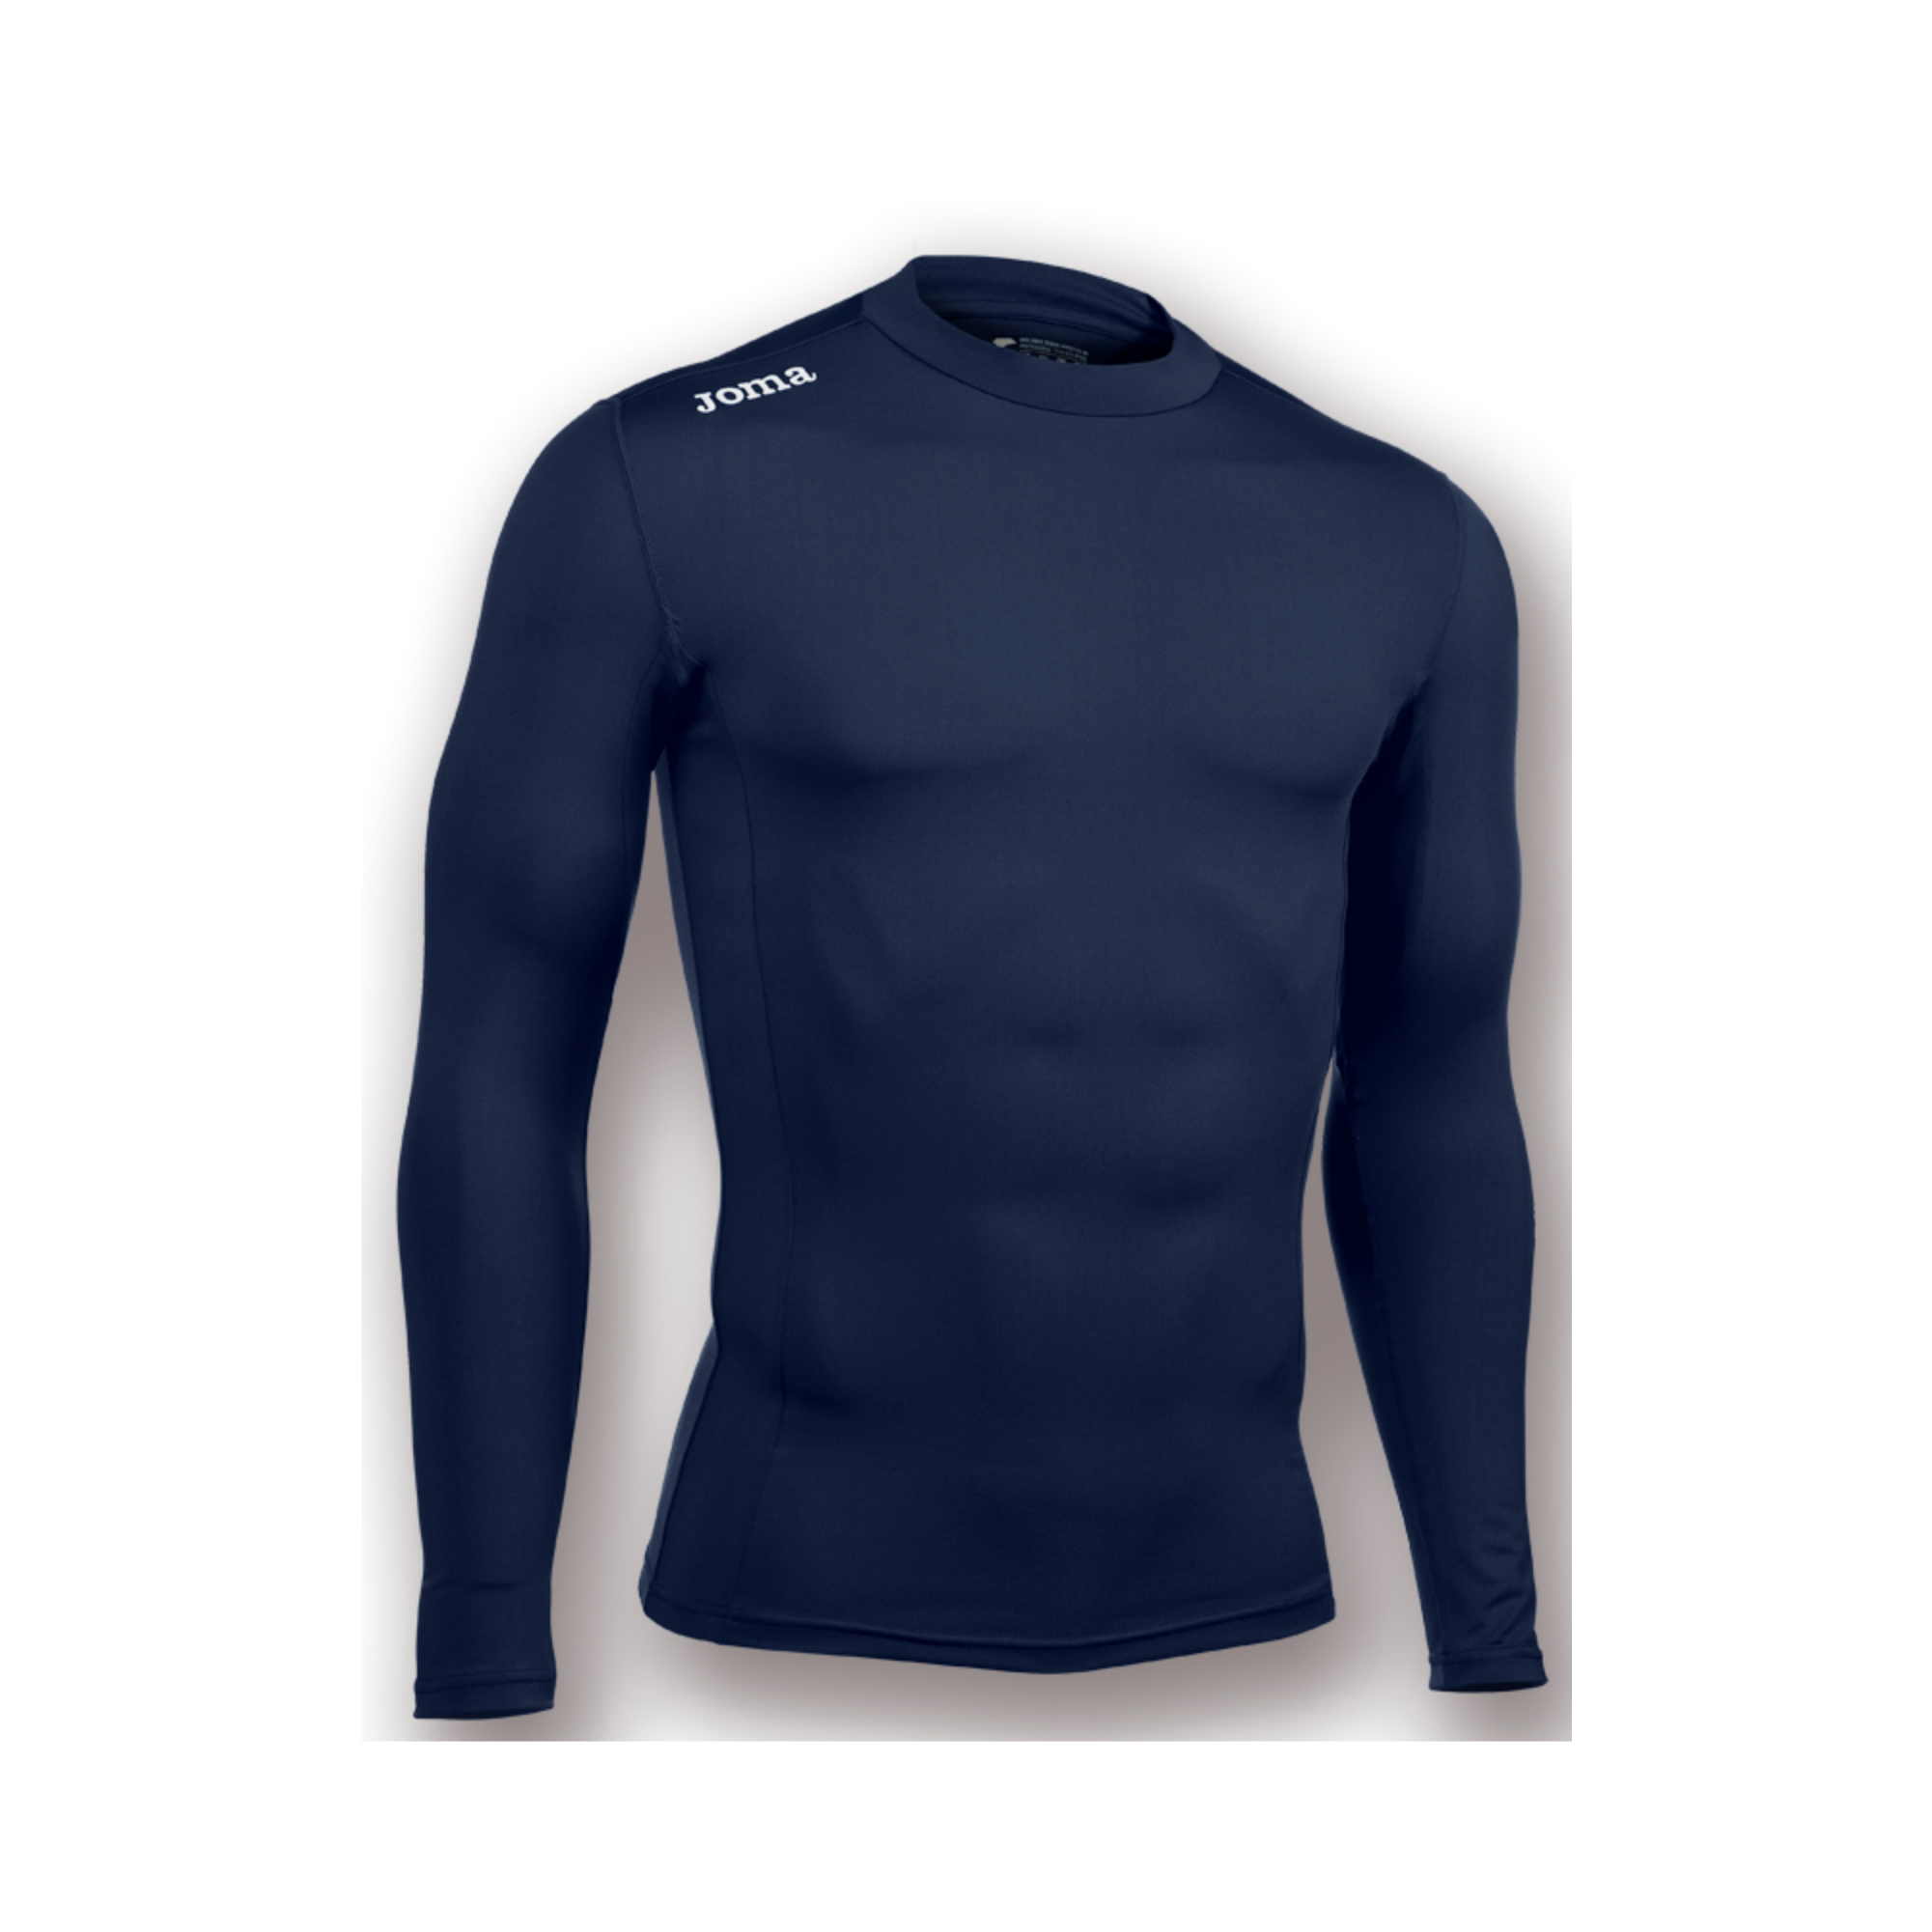 5dfbd4dc8 Brama Academy Long Sleeve - JFC Sports